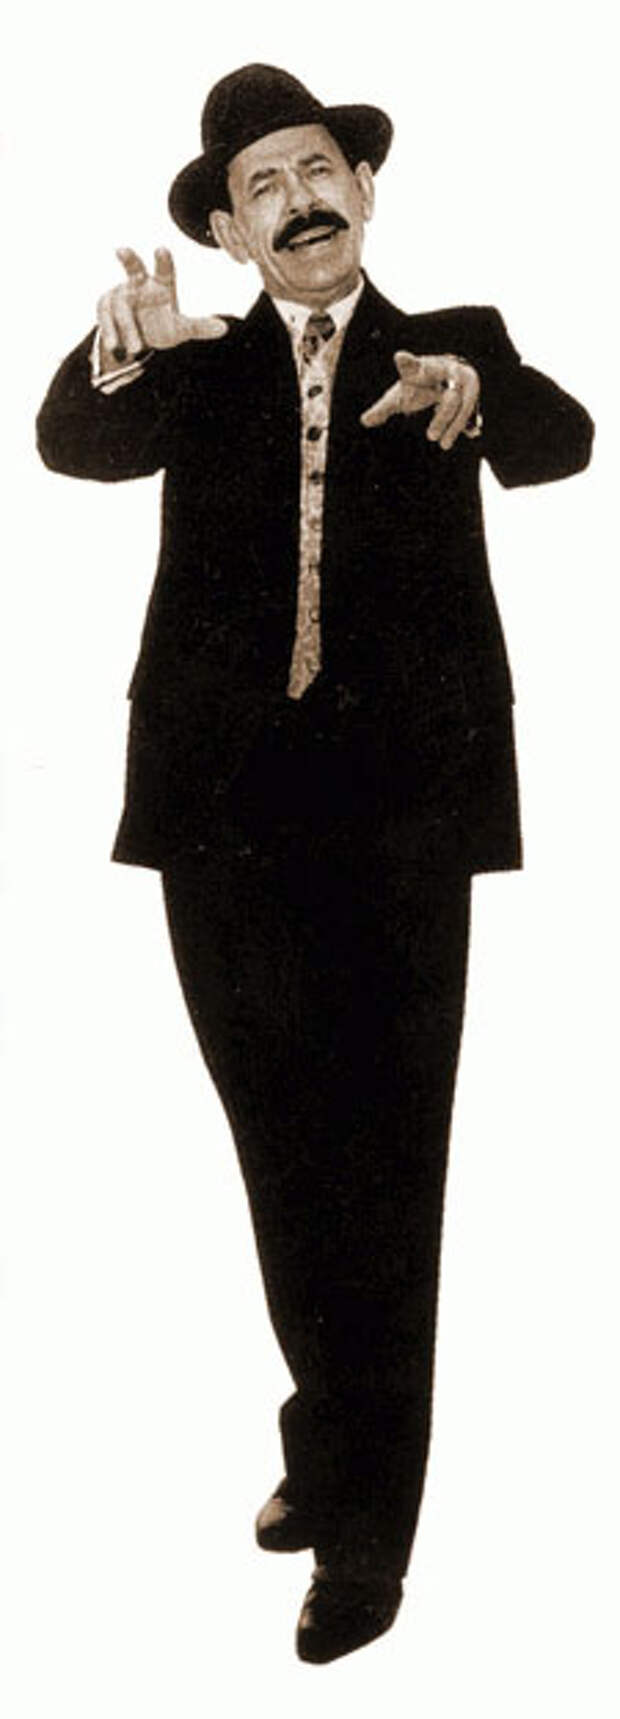 Персоны 90-ых: Скэтмэн Джон